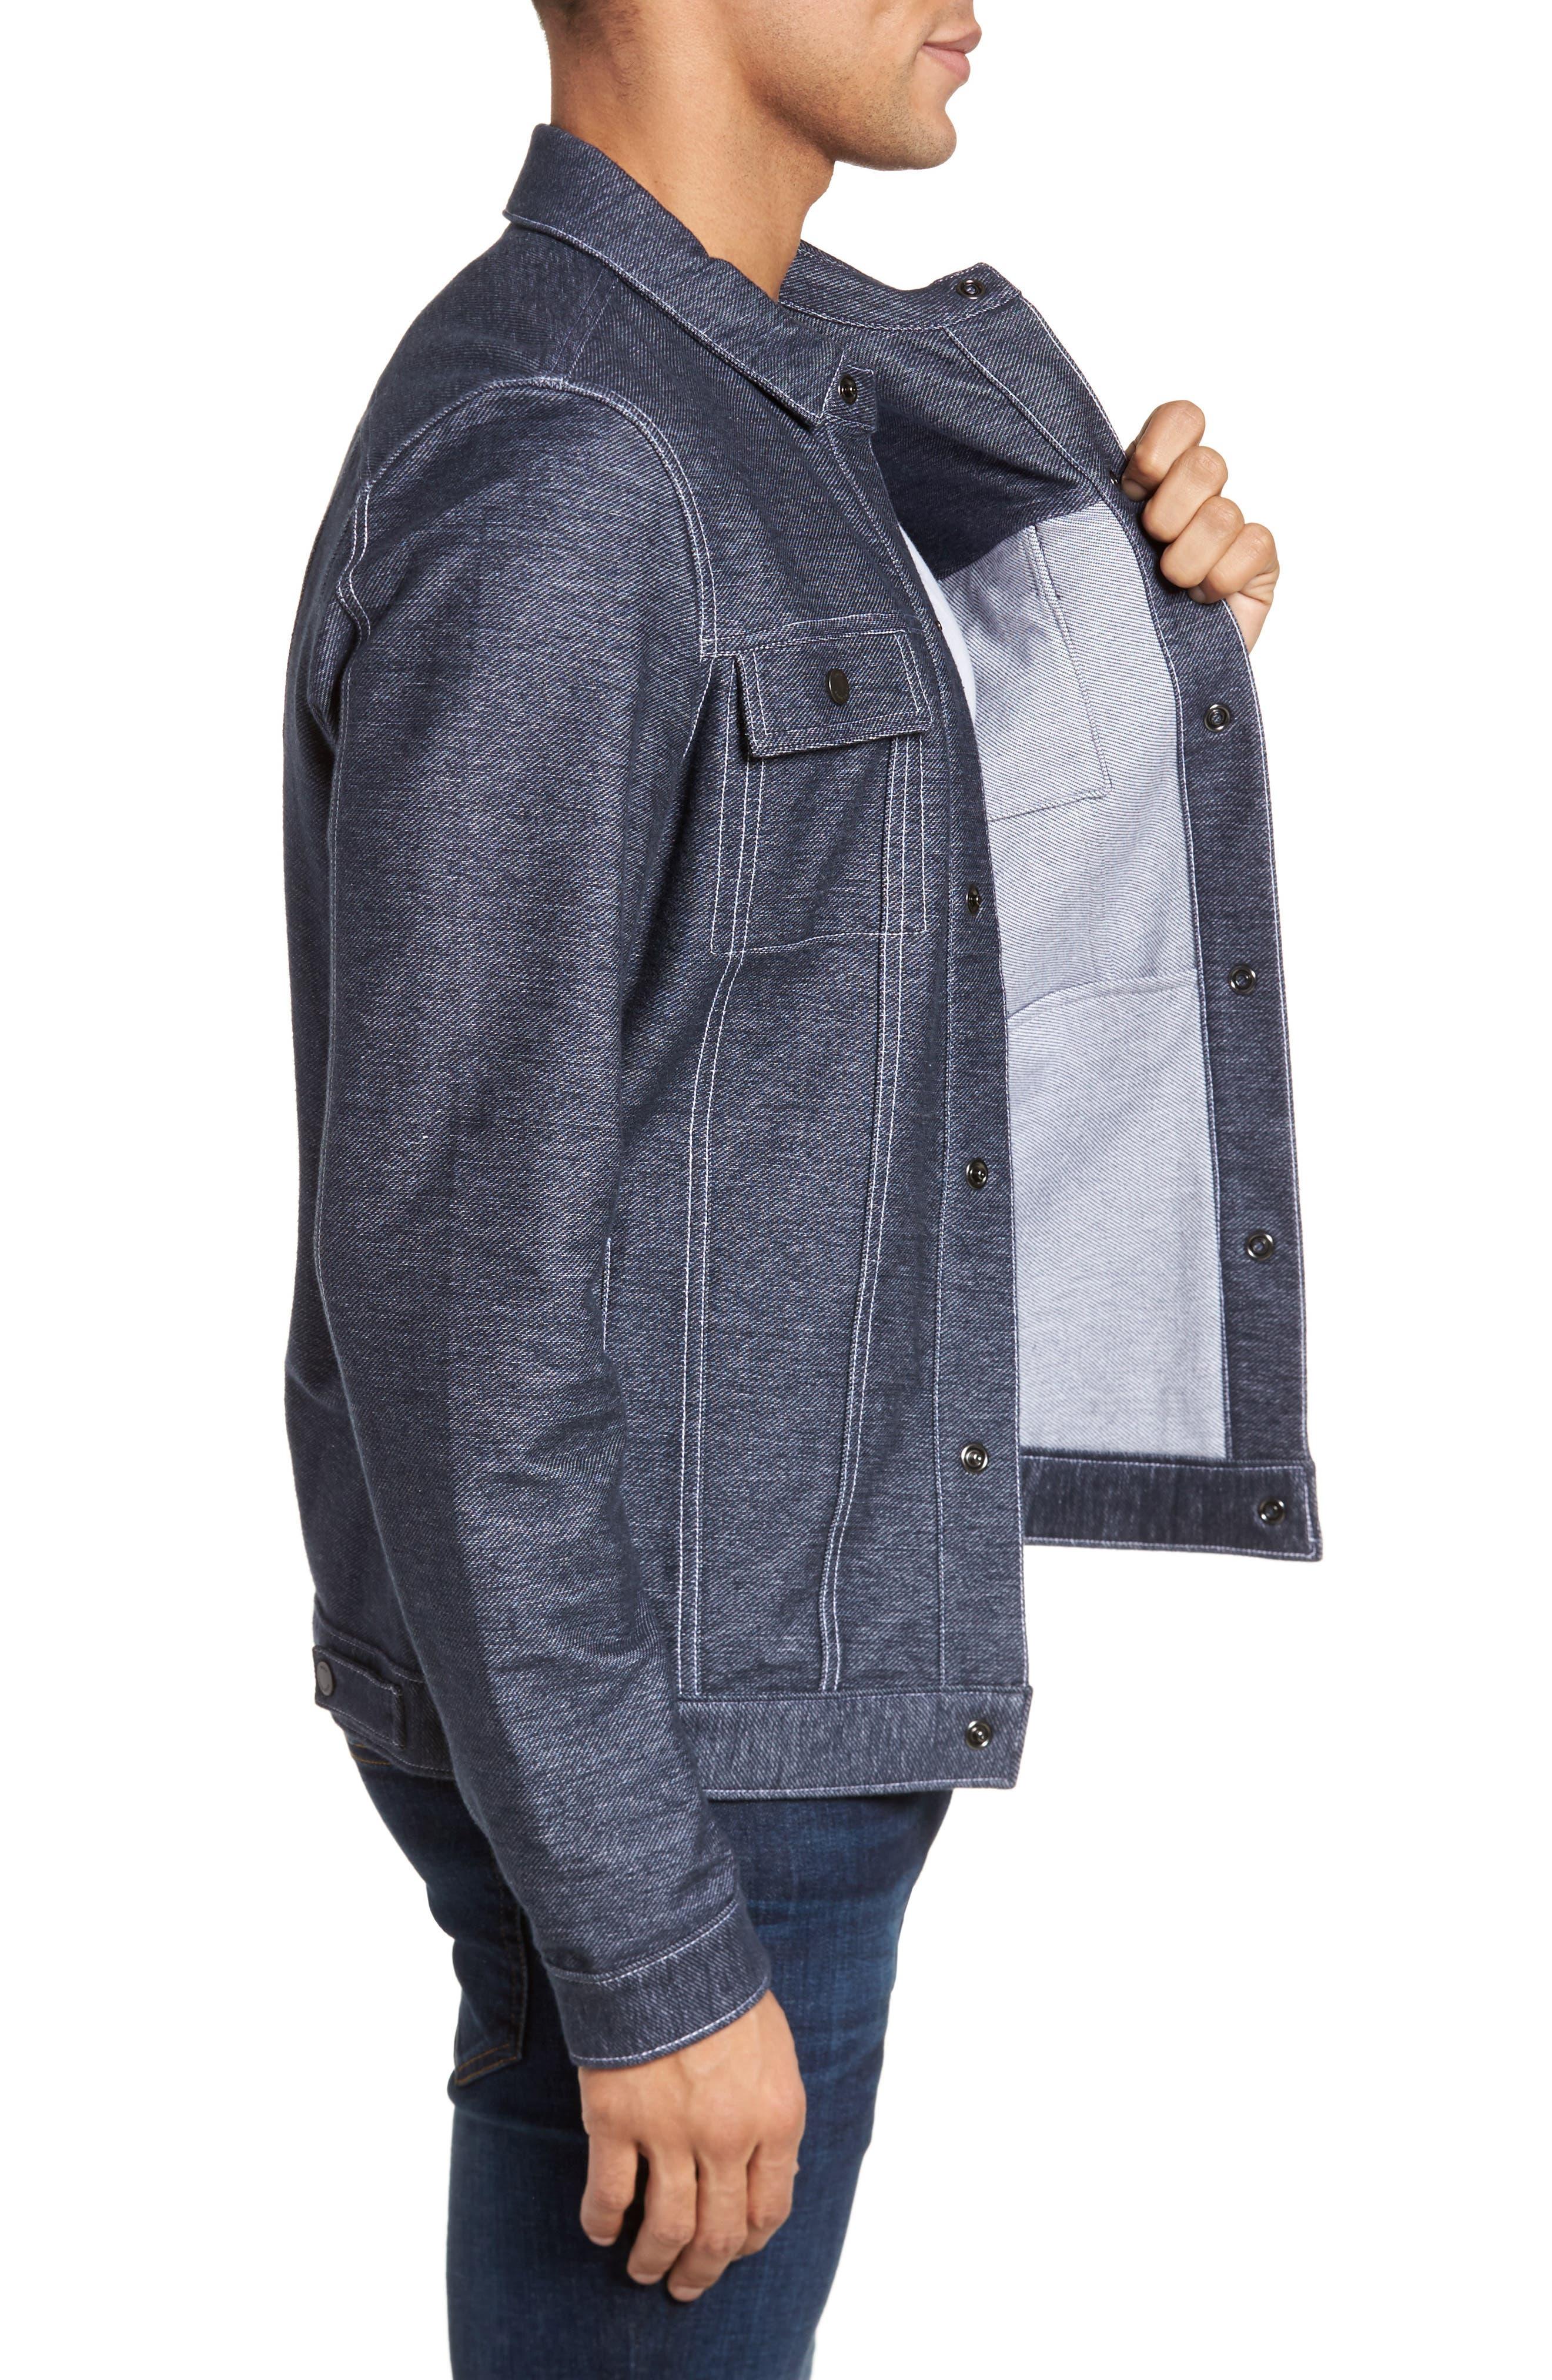 Sigmon Stretch Denim Jacket,                             Alternate thumbnail 3, color,                             410